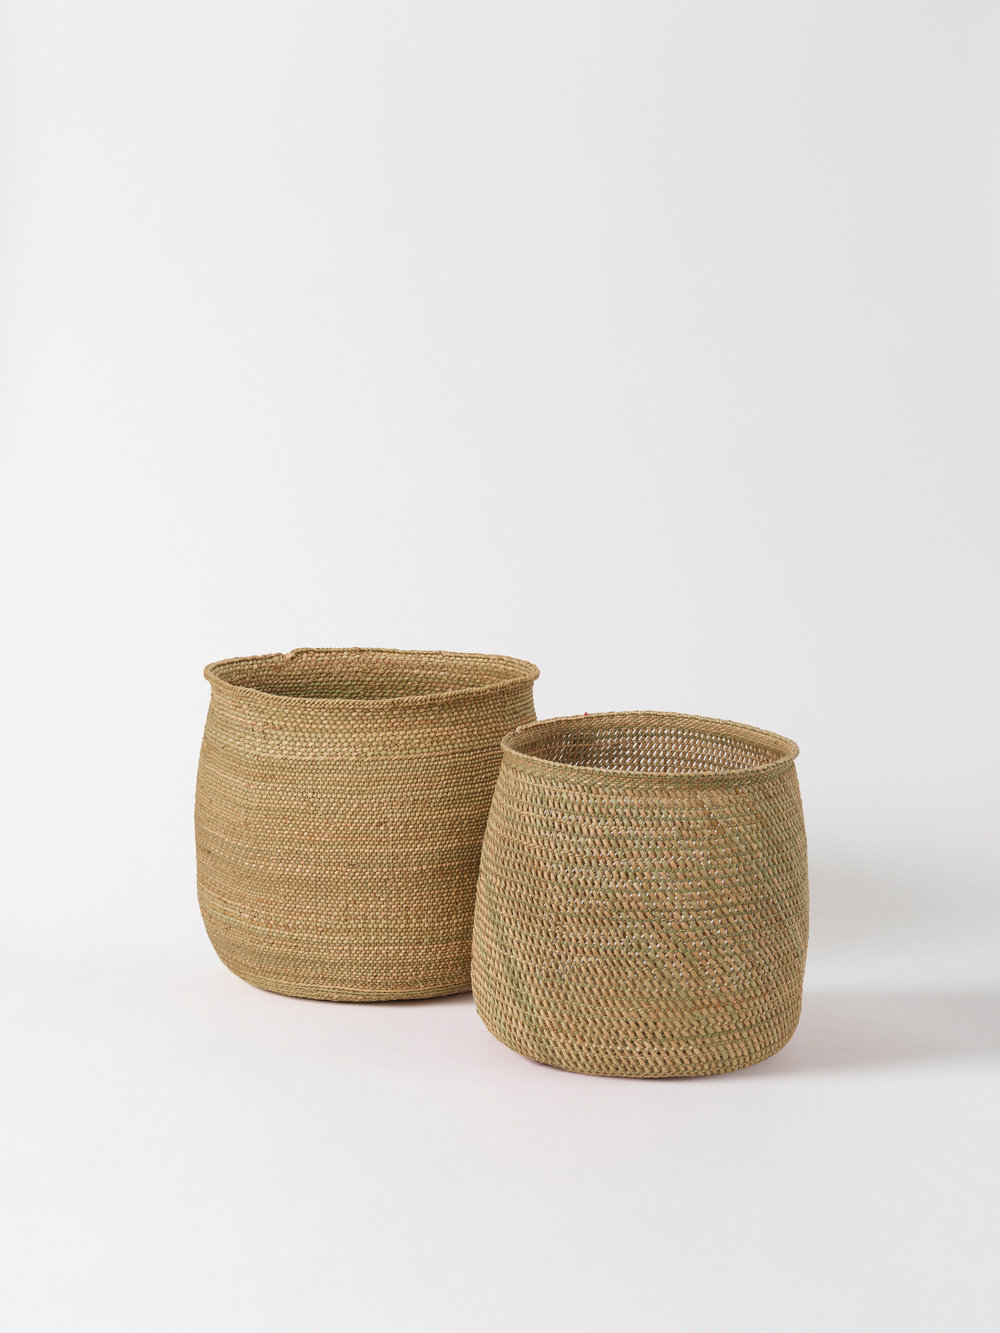 Iringa Woven Baskets From $84